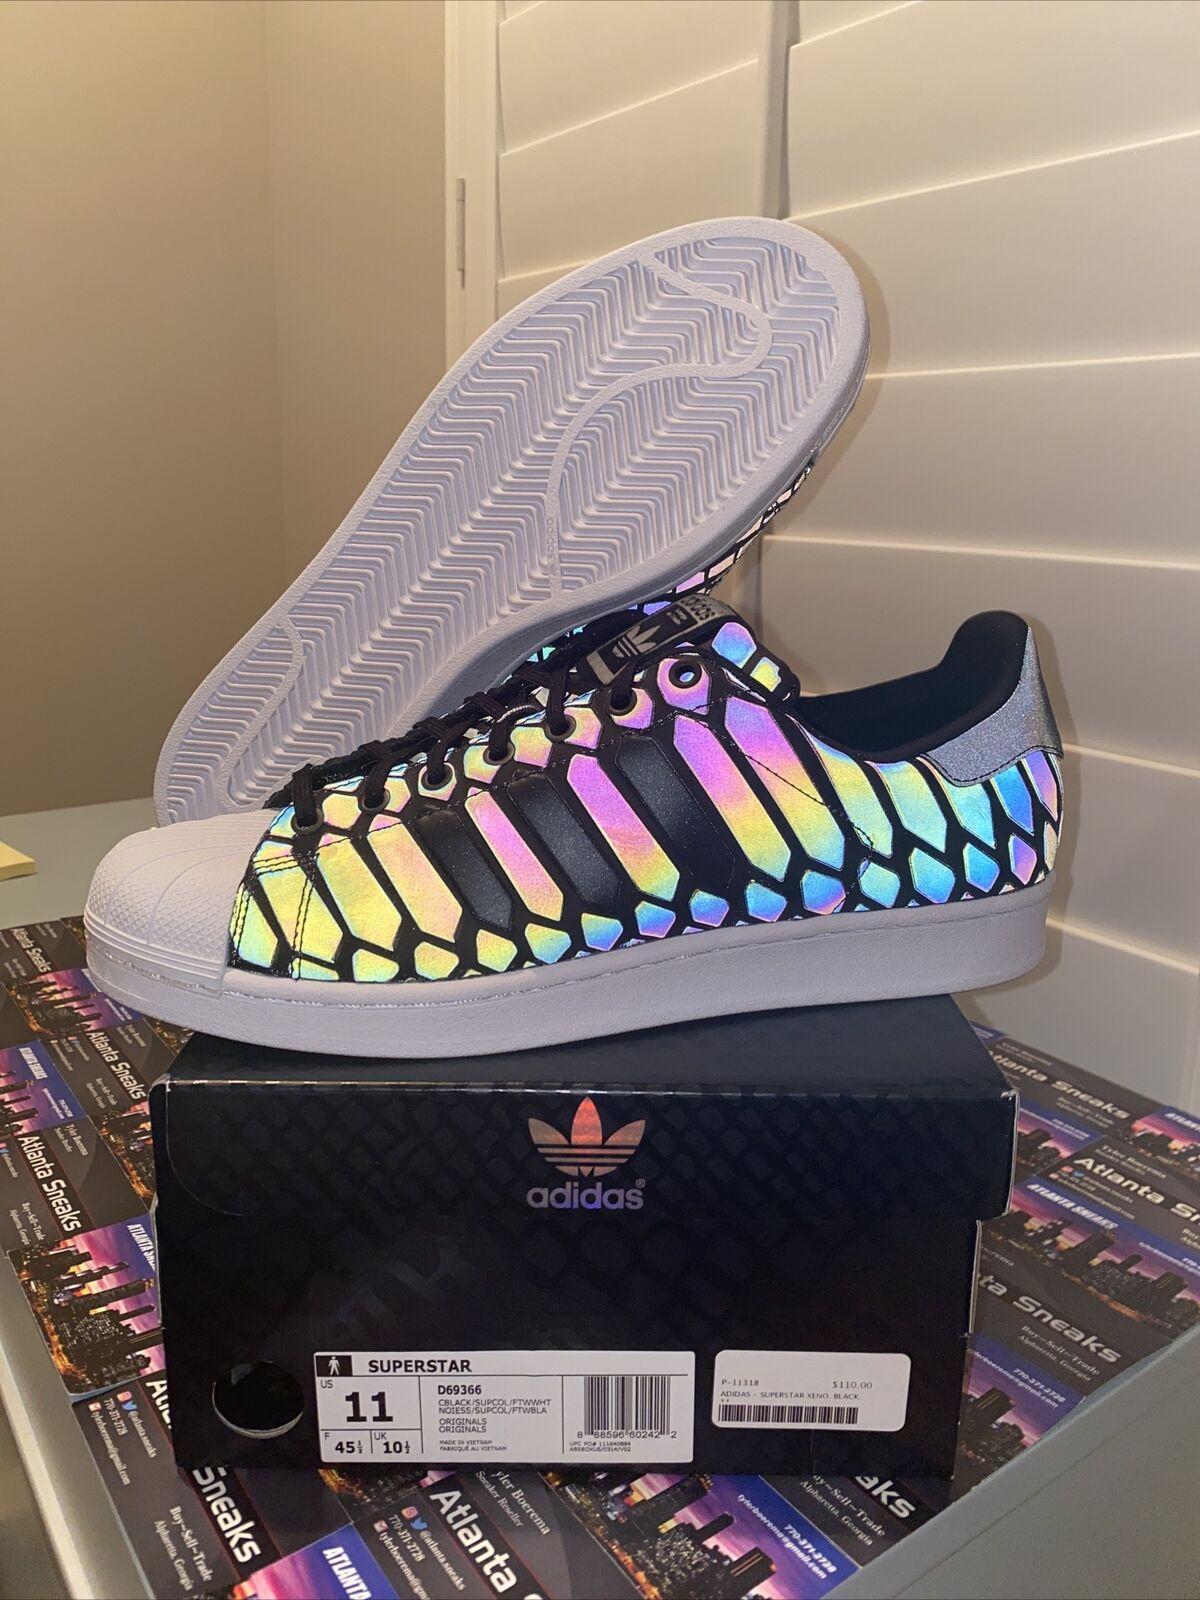 Size 11 - adidas Superstar Xeno 2015 - D69366 for sale online   eBay